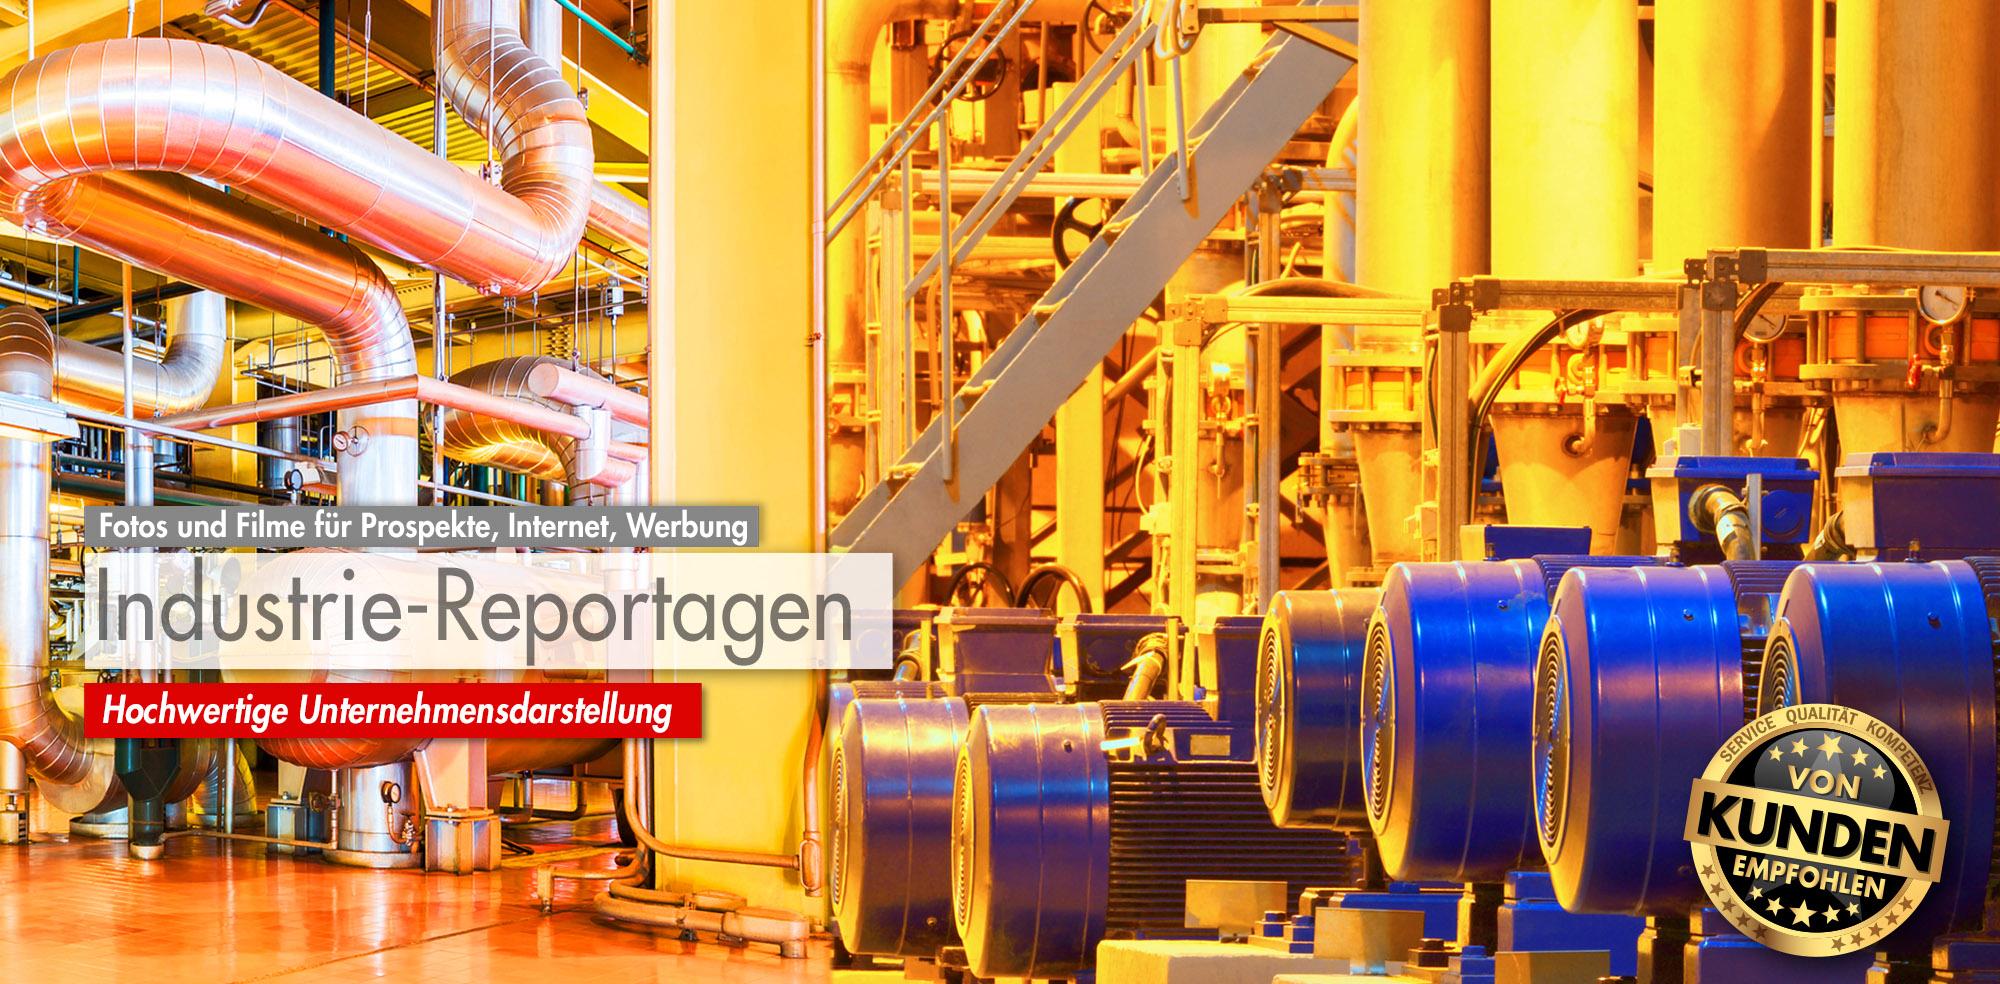 Imagefilme, Industriefilme, Industriefotografie Firmenreportagen @ BlickFang2 Fotostudio, Filmstudio in Weinheim und Andernach, Fotograf